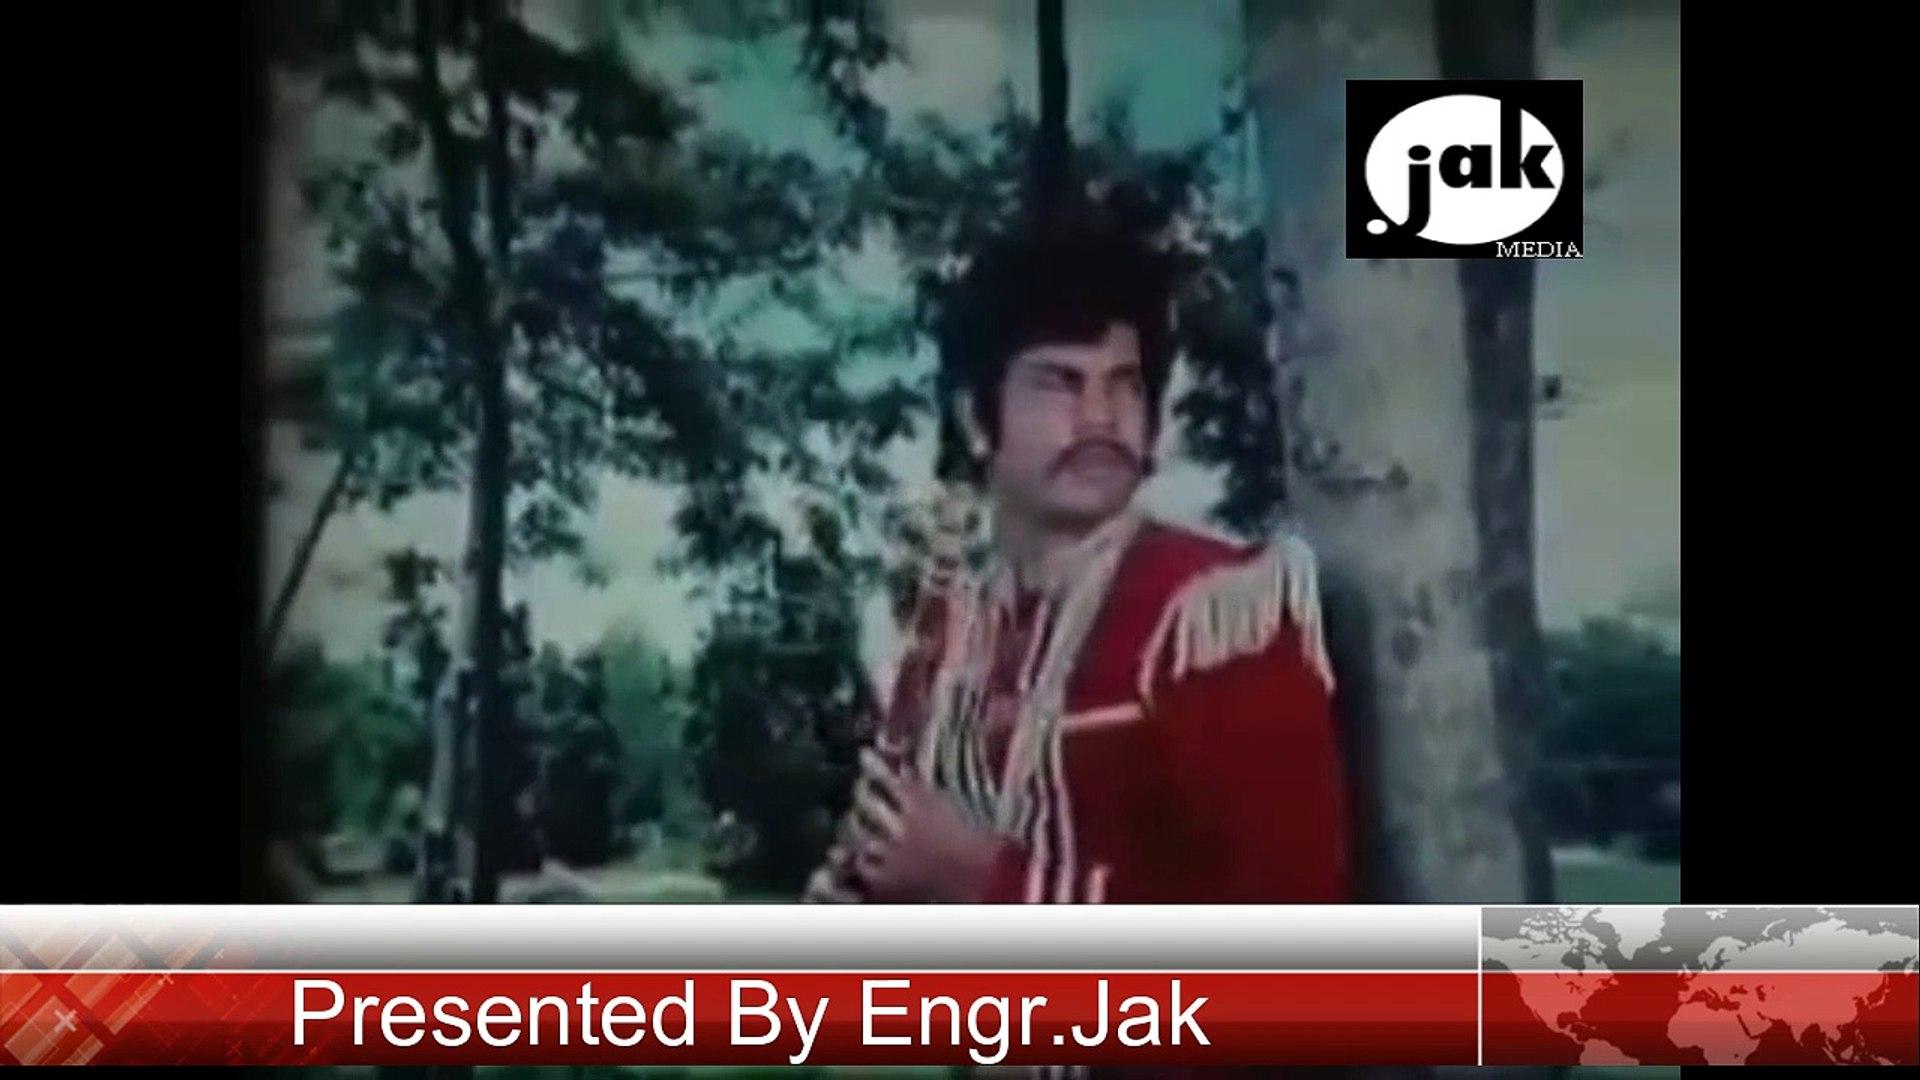 beder meye joshna amay kotha diyese presented by Engr Jak